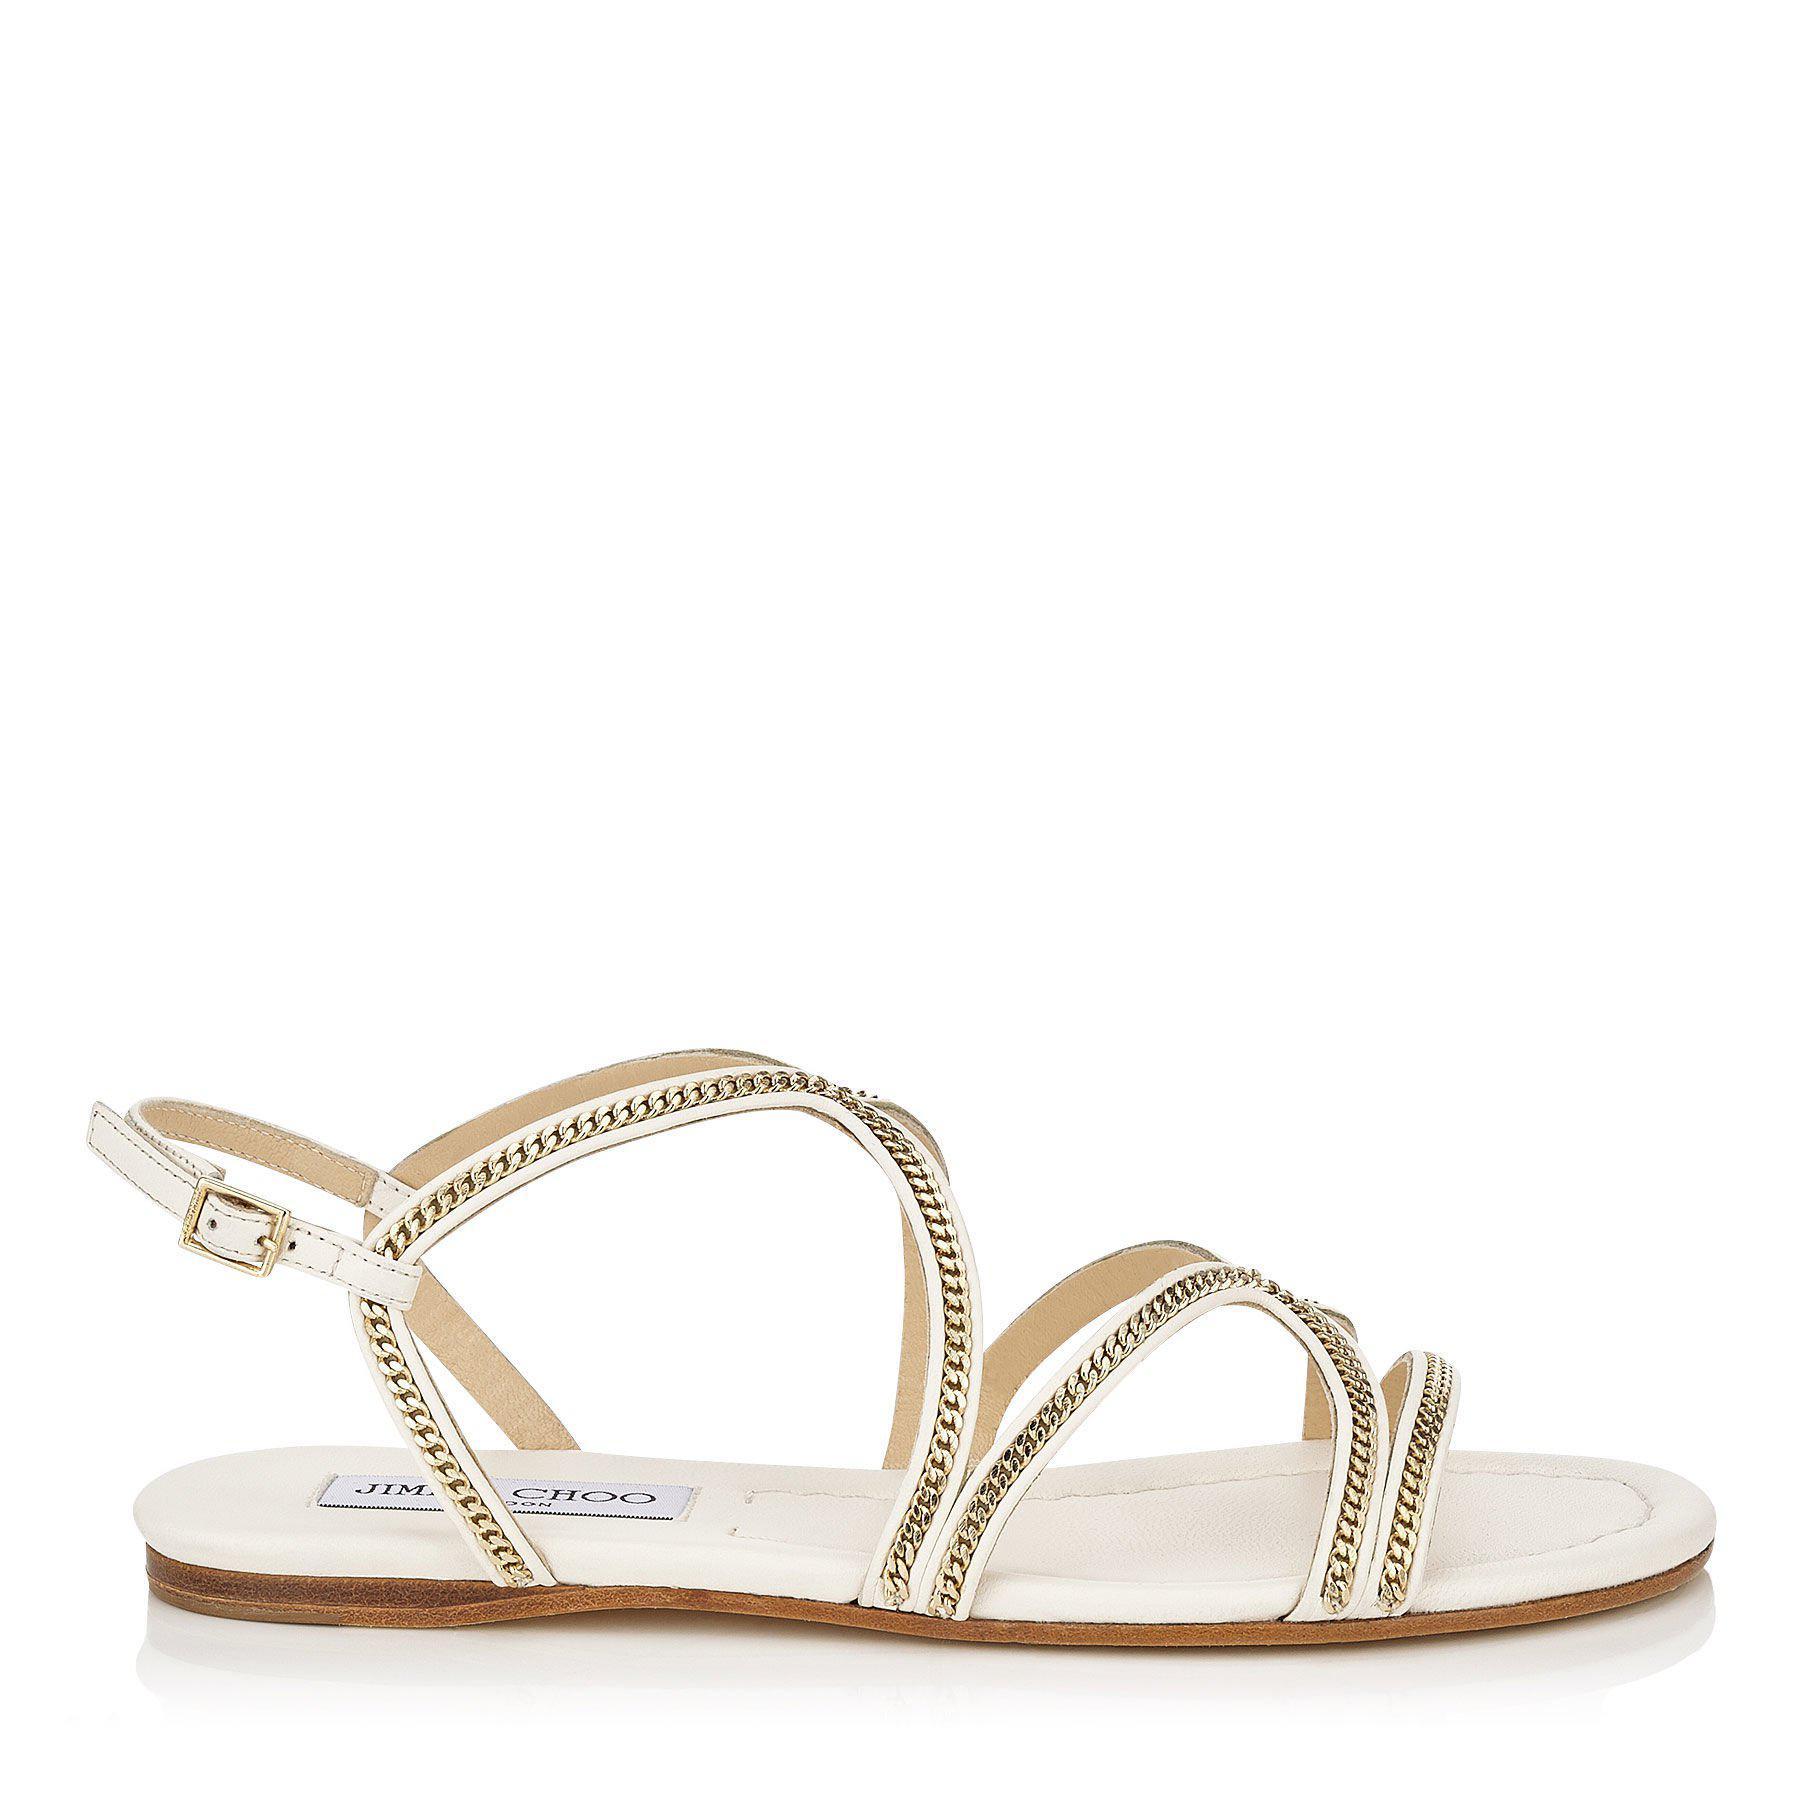 527f7c6e6d1b85 Lyst - Jimmy Choo Nickel Flat Latte Leather Flat Sandals in Brown